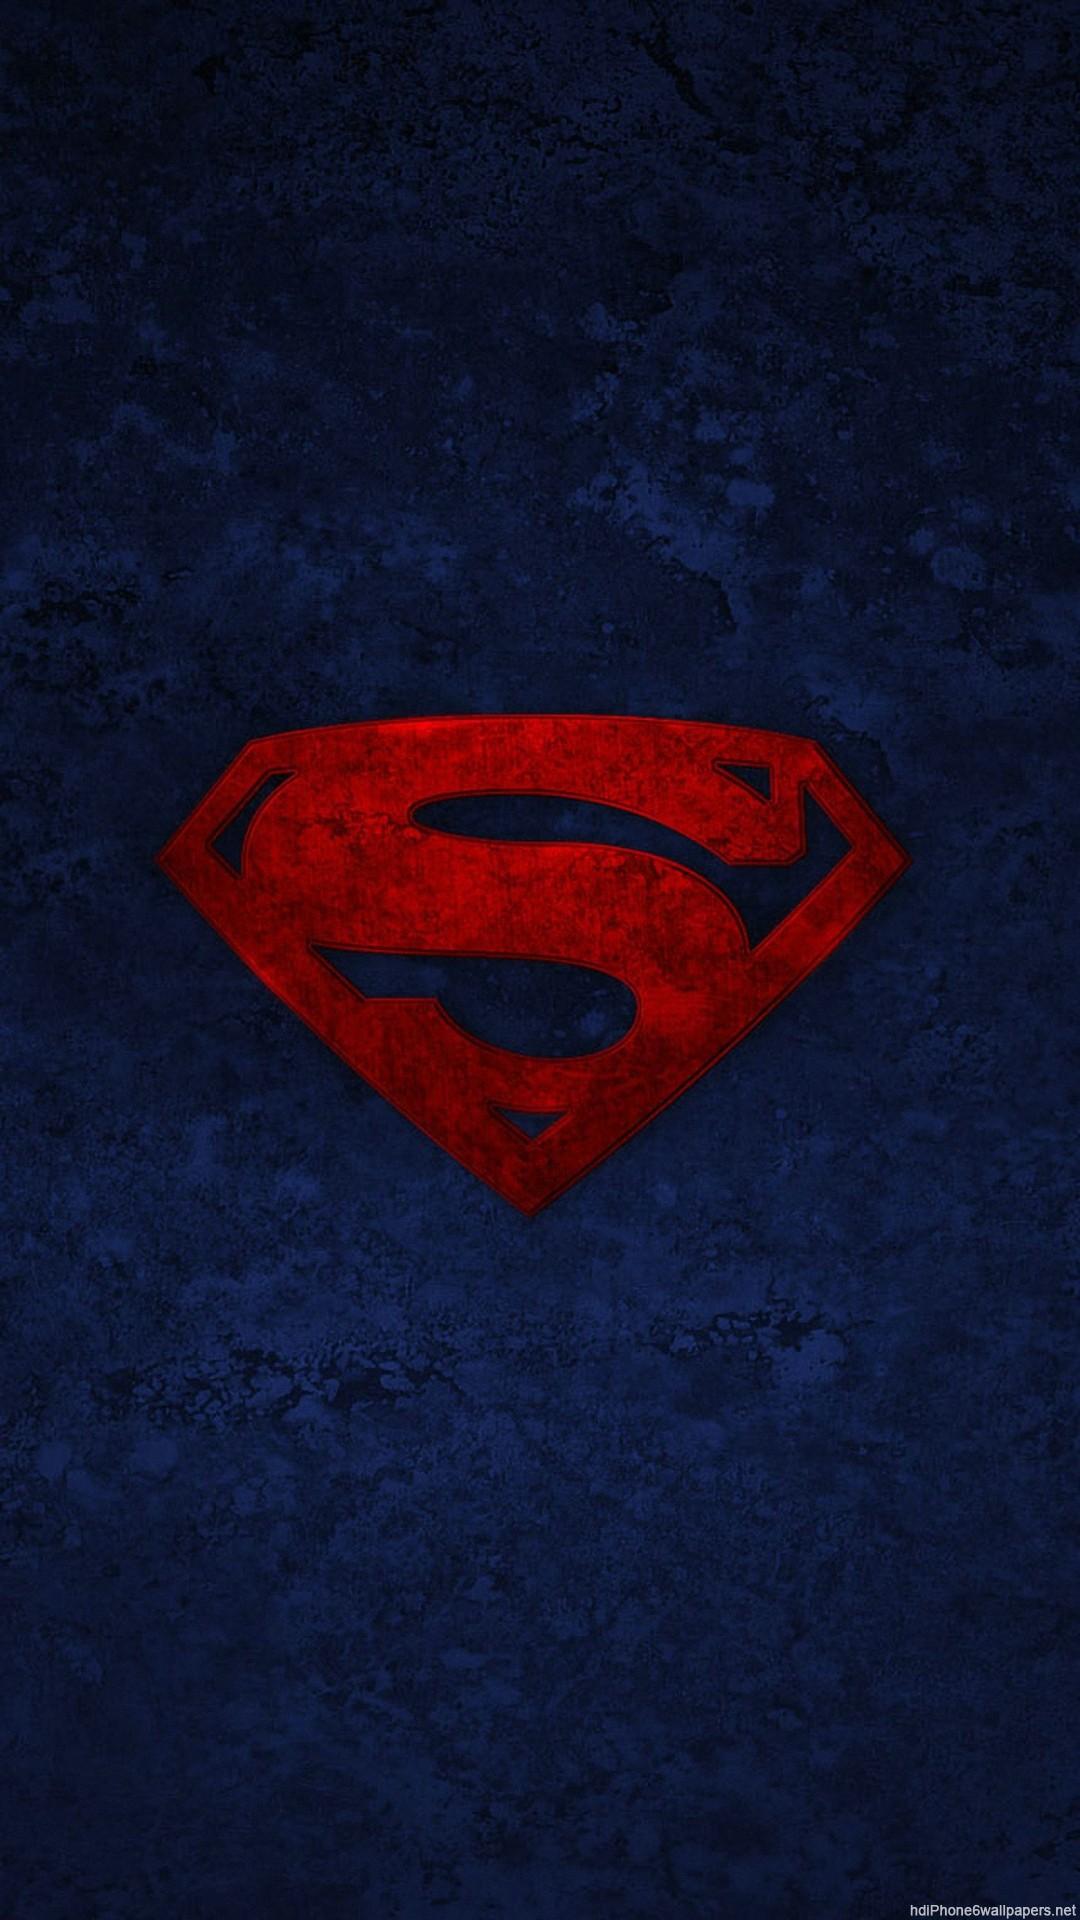 1080x1920 HD Superman logo iphone 6 wallpaper